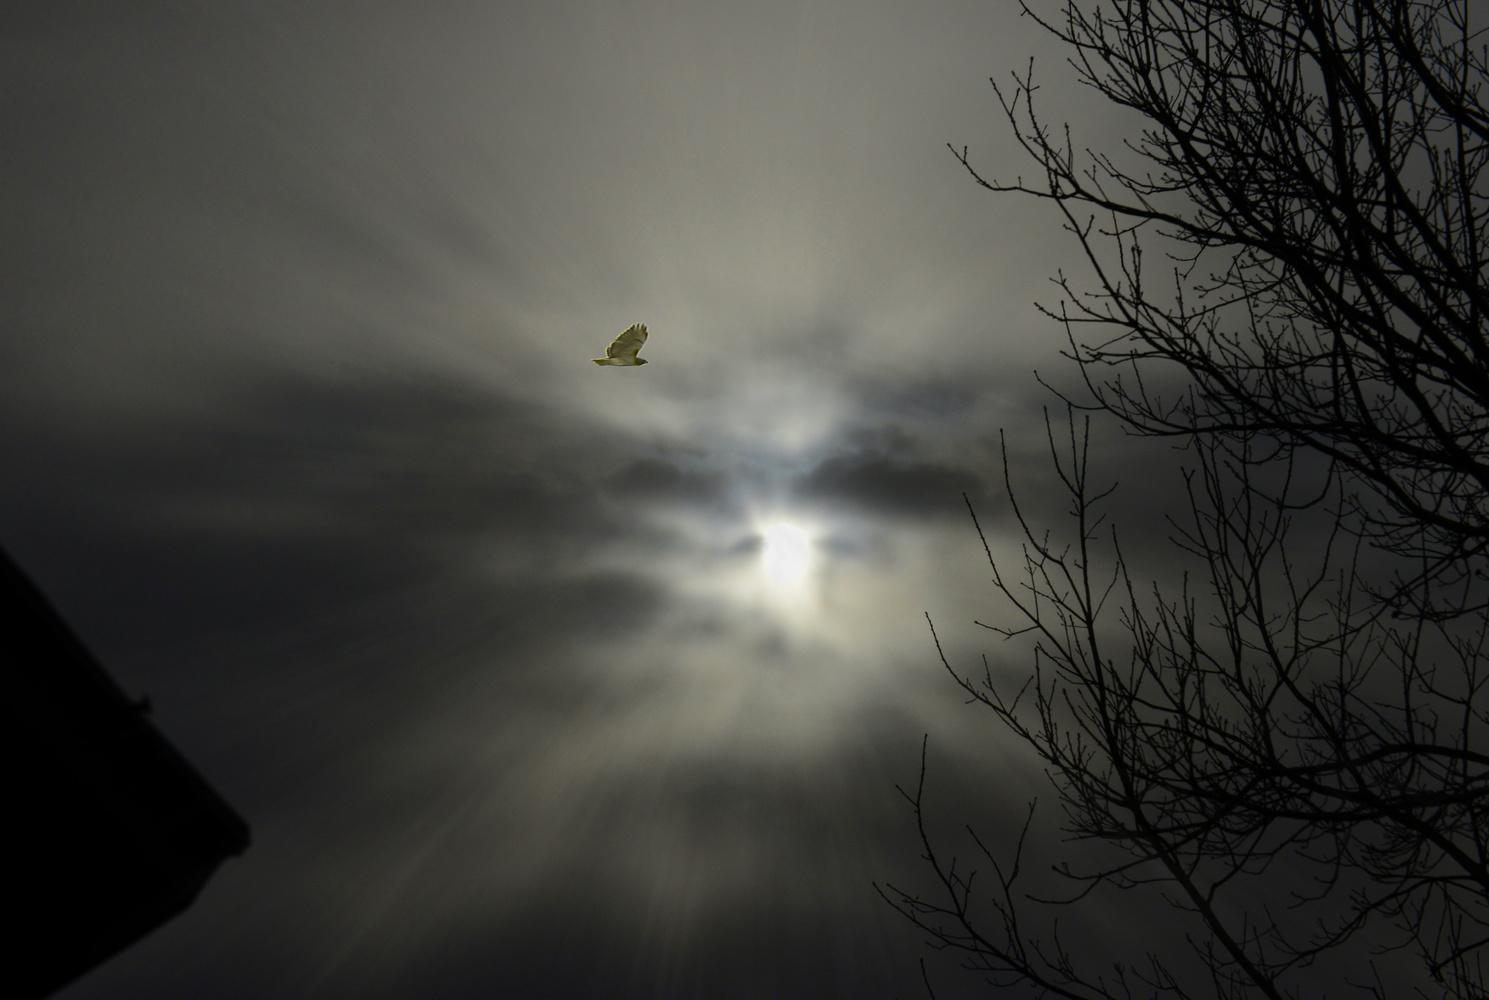 Bird of Prey by Manny Gonzales